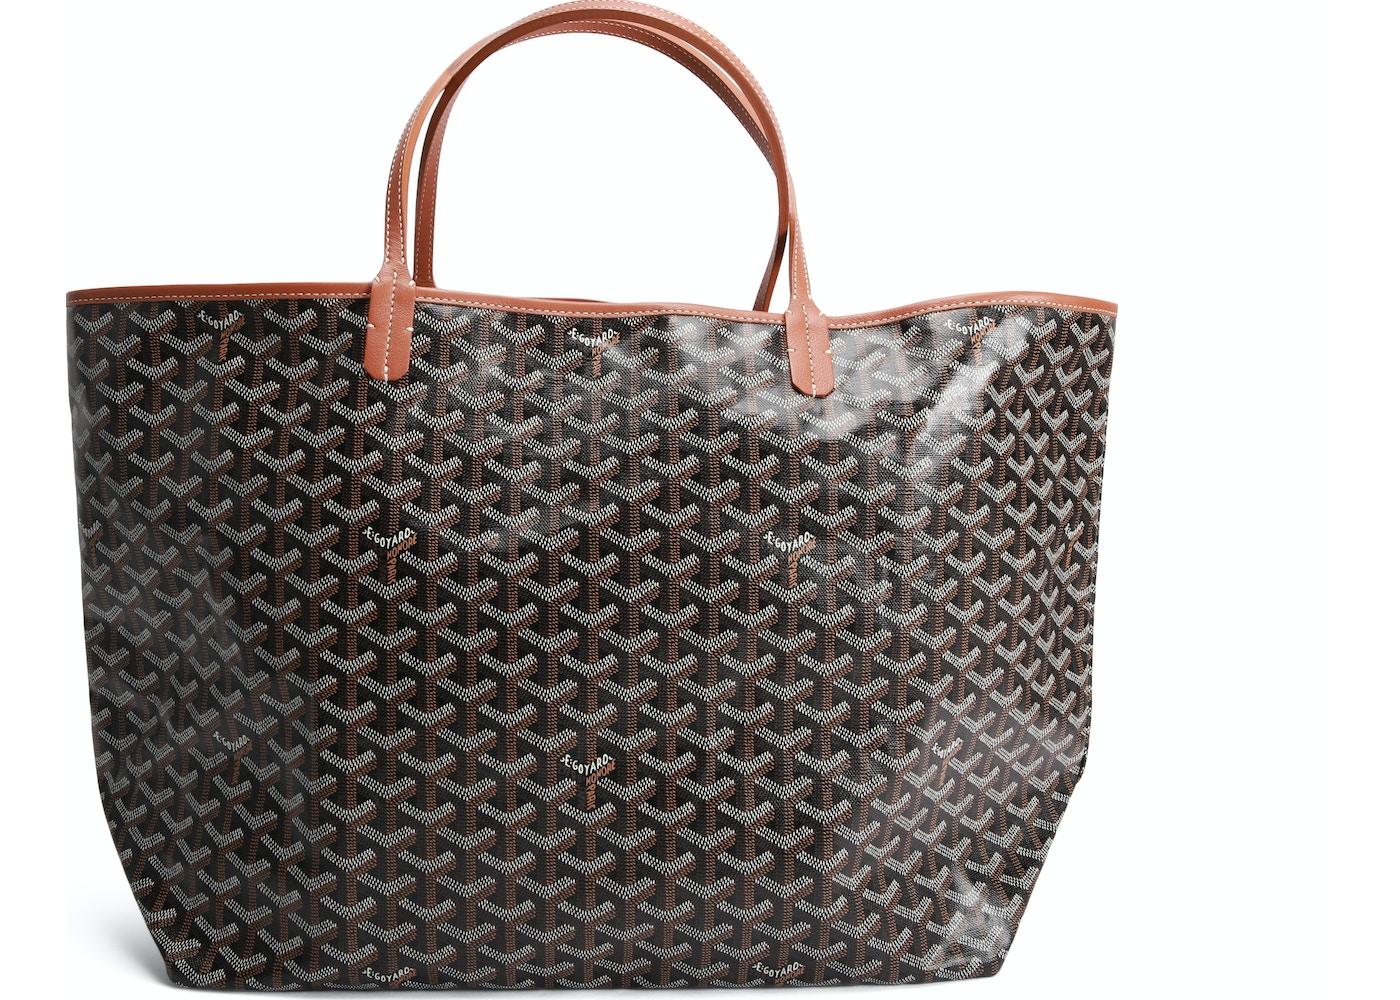 e8ae378d10b25e Bag and Purse Organizer with Singular Style for Goyard St Louis Models